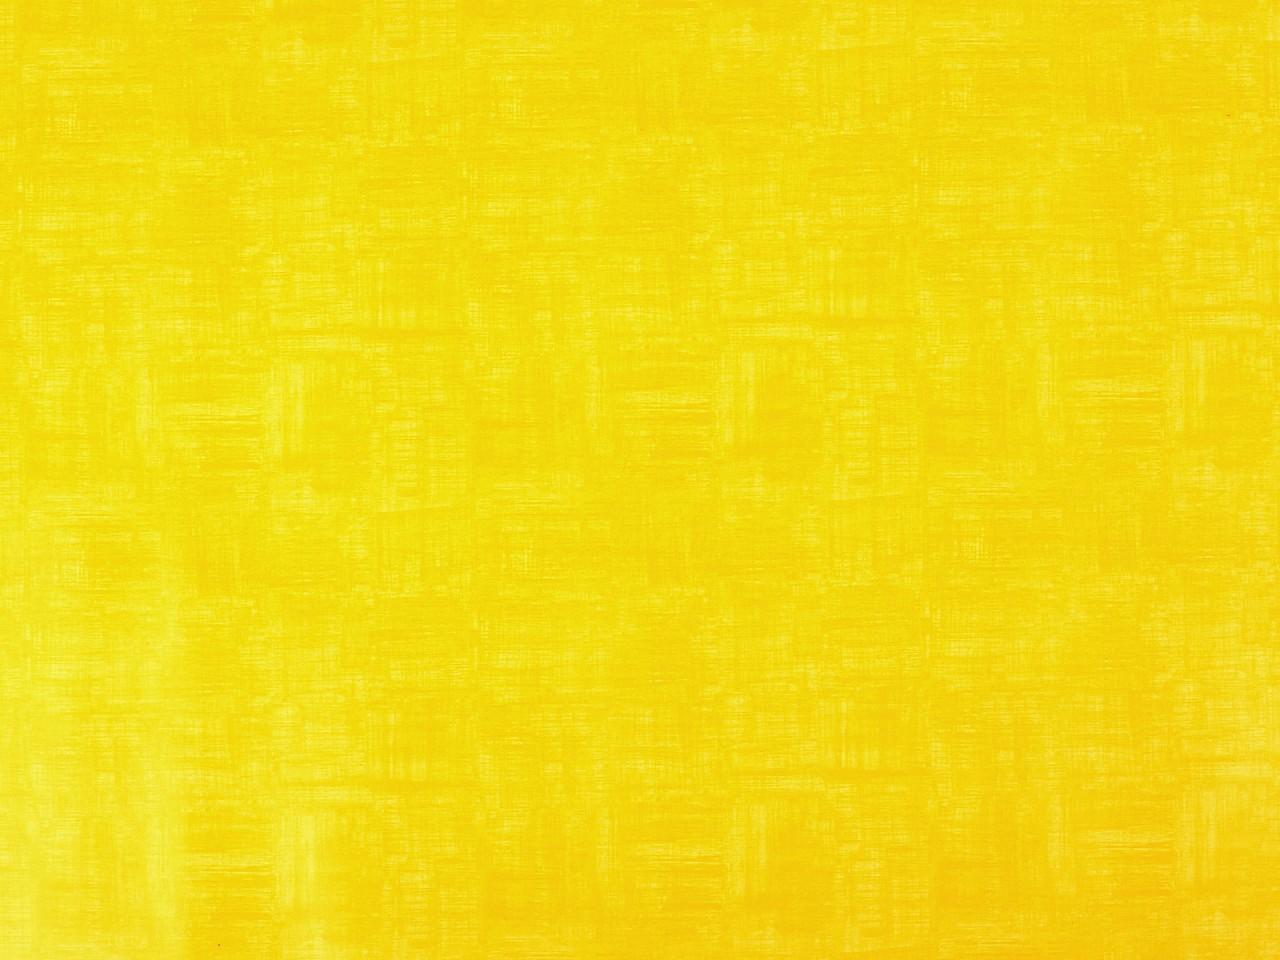 Balicí papír jednobarevný 0,7x2 m 1 ks